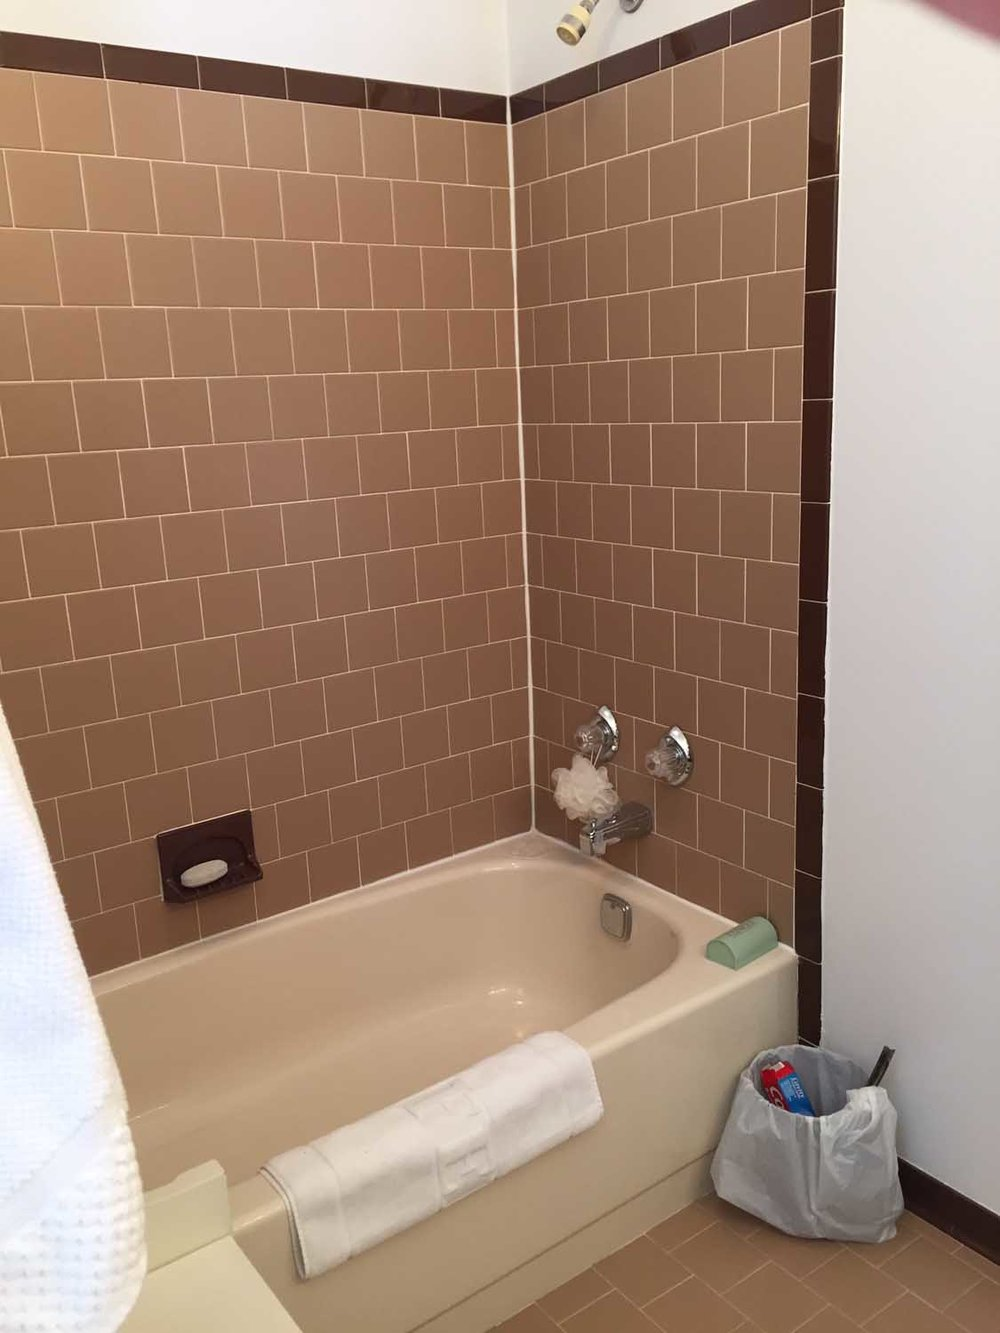 Columbia Maryland Outdated 80s Bathroom Before Modern Remodel– Designer Bestie April Force Pardoe Interiors.jpg